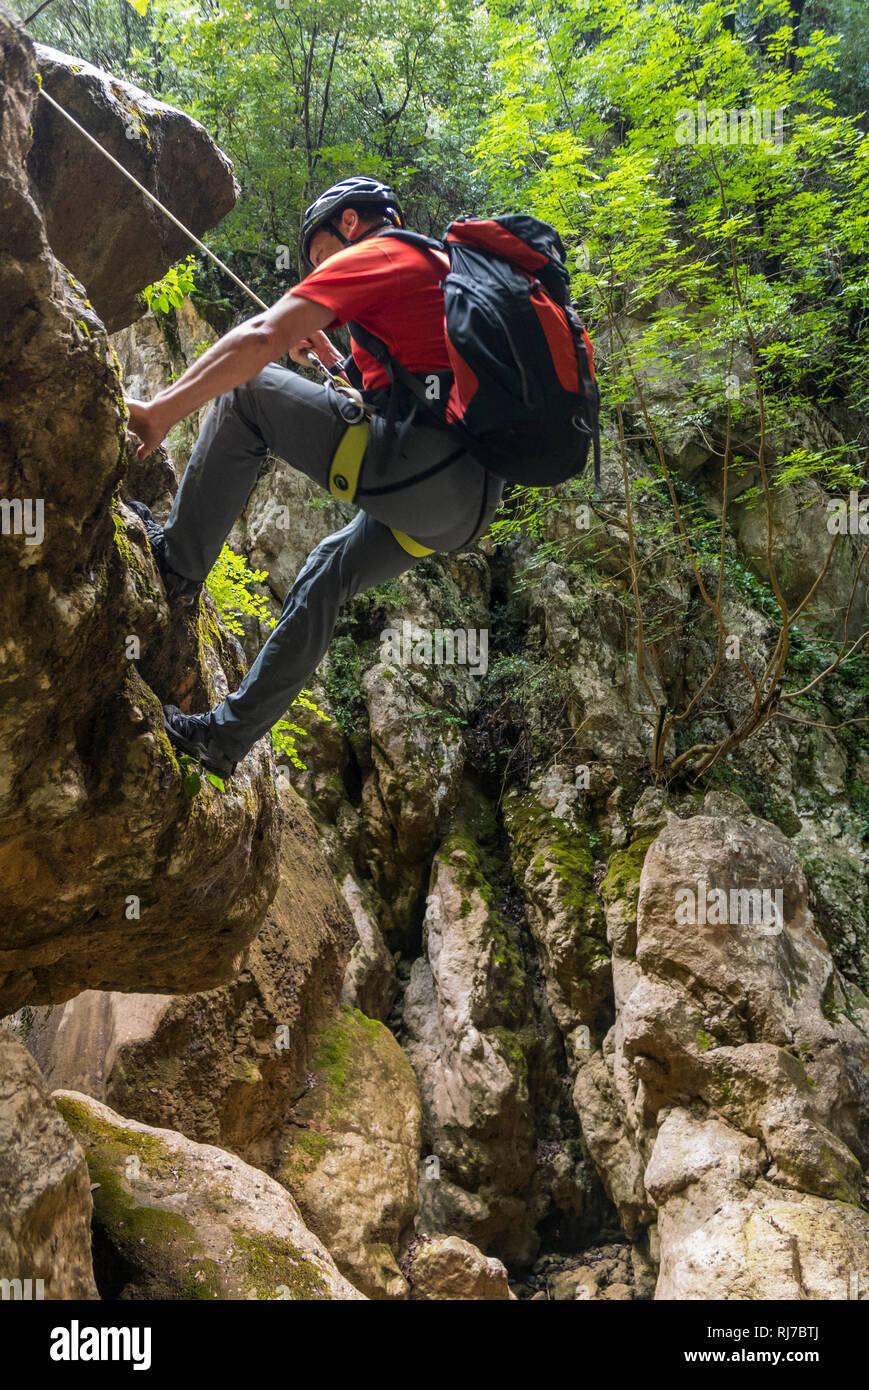 Albanien, Balkanhalbinsel, Südosteuropa, Republik Albanien, Klettern in der Gjipe Schlucht - Stock Image